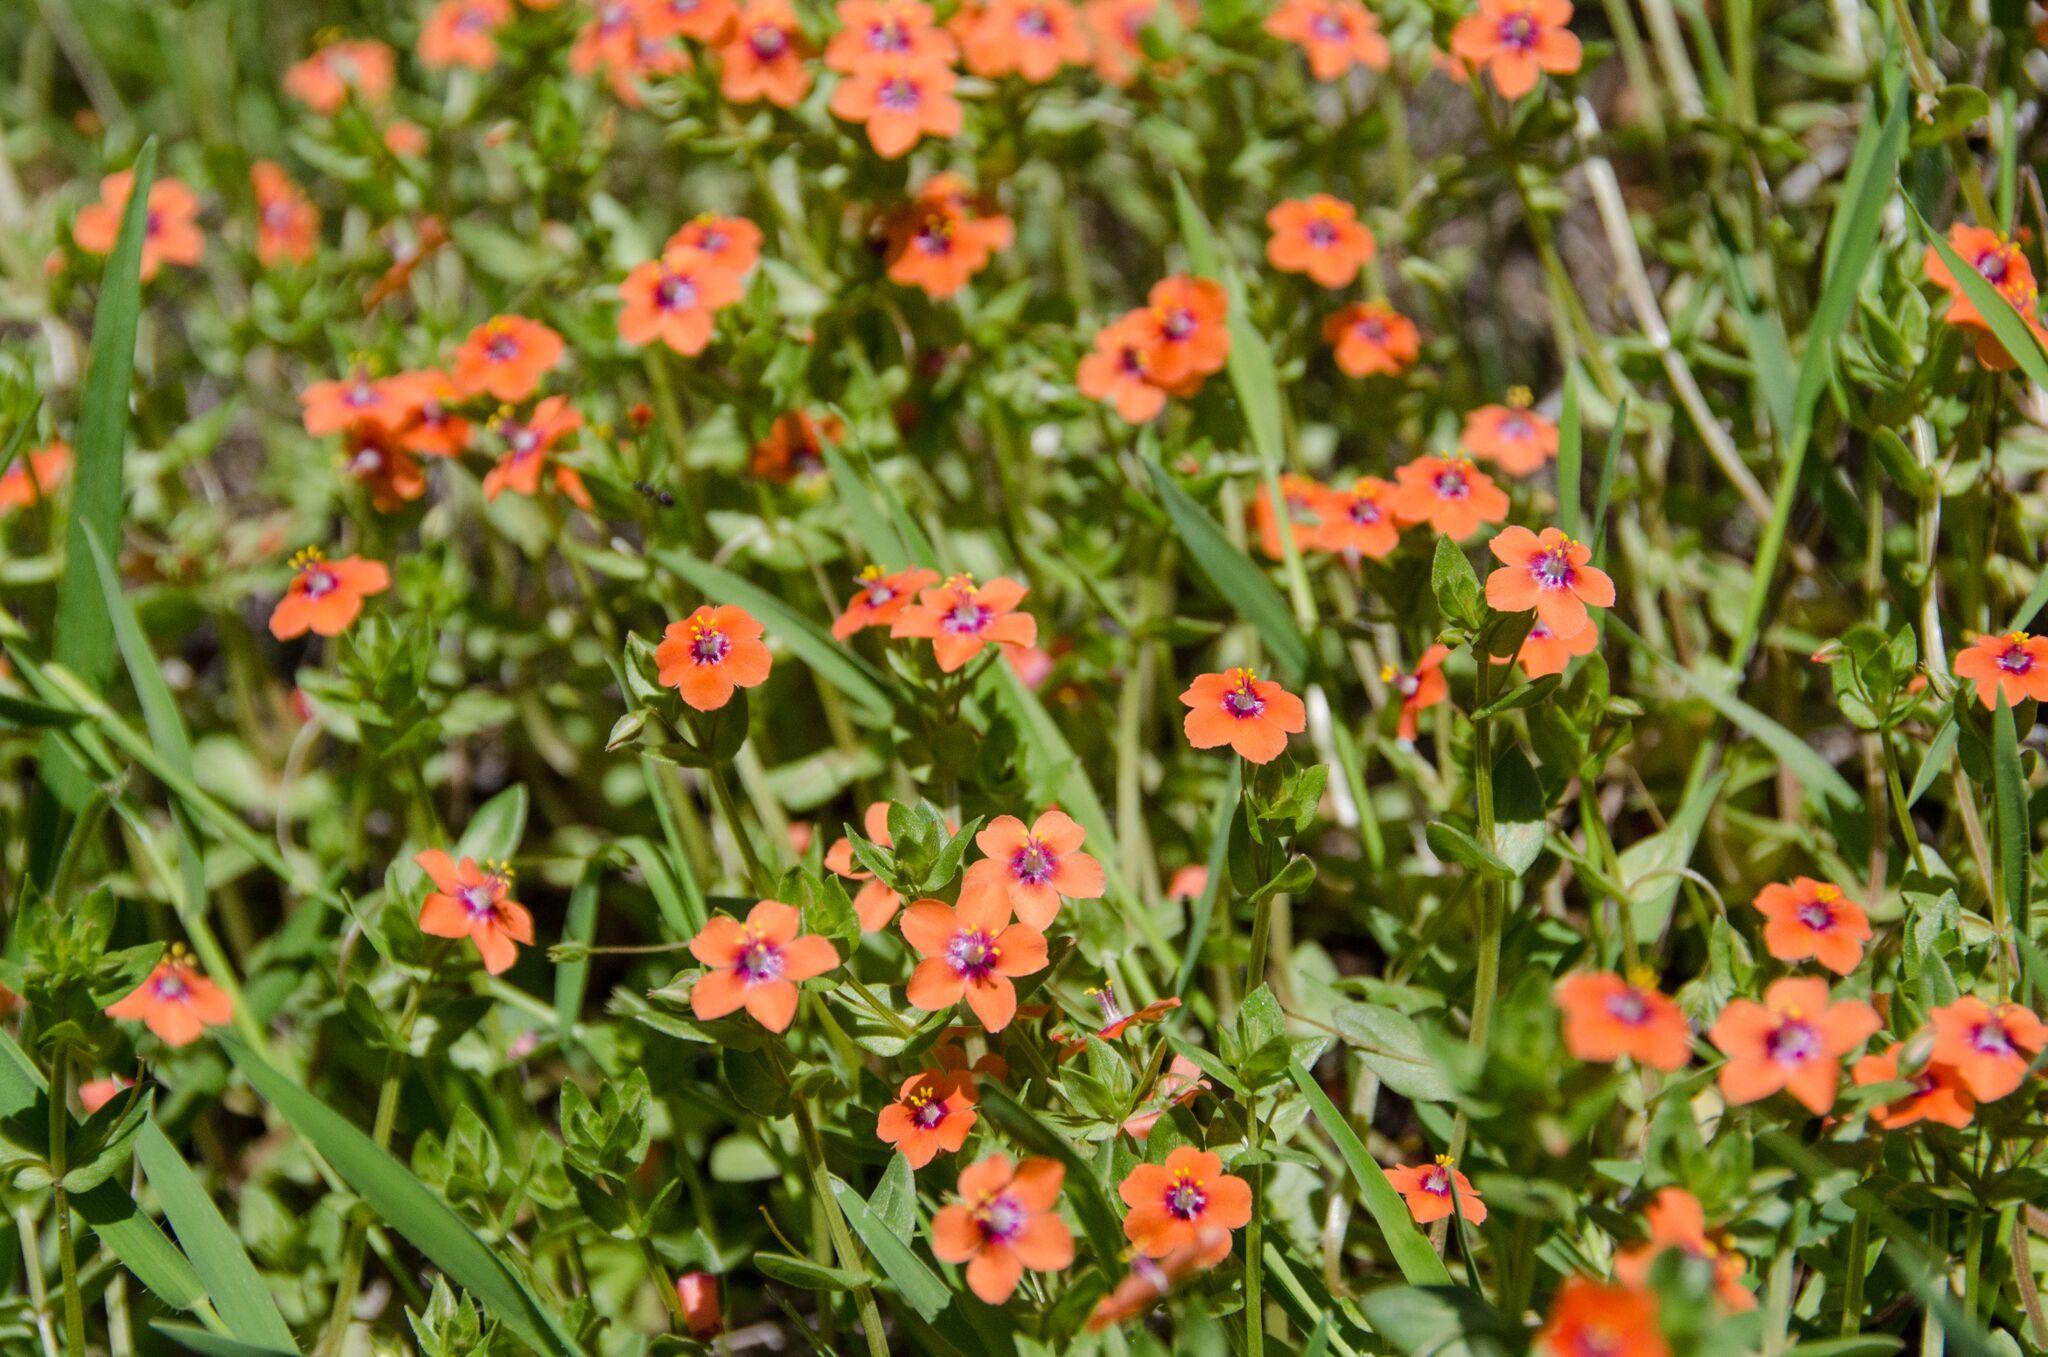 Mayfair-Trail_Rancho-Canada-del-Oro-Open-Space-Preserve_Cassie-Kifer_preview